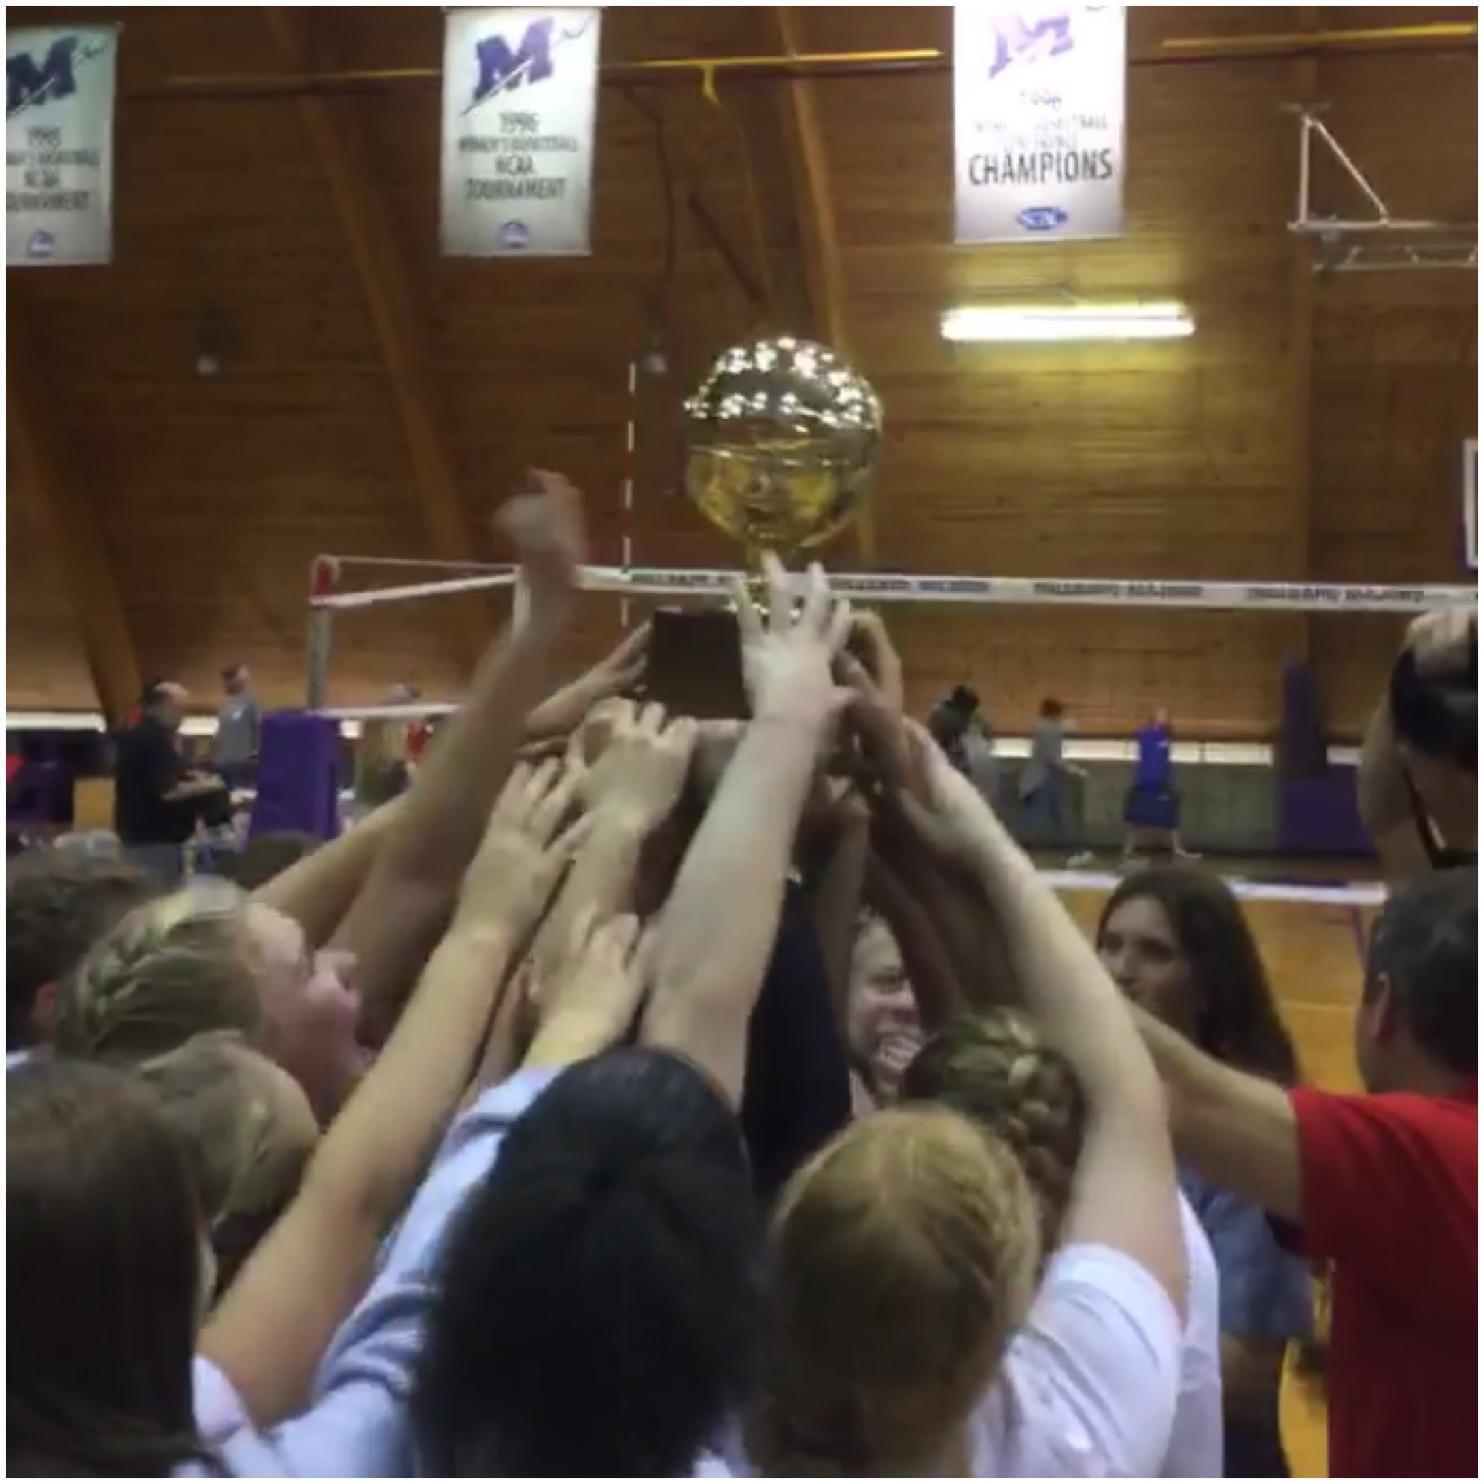 The OHS Volleyball team hoists the golden ball after winning the MHSAA Class II State Championship.